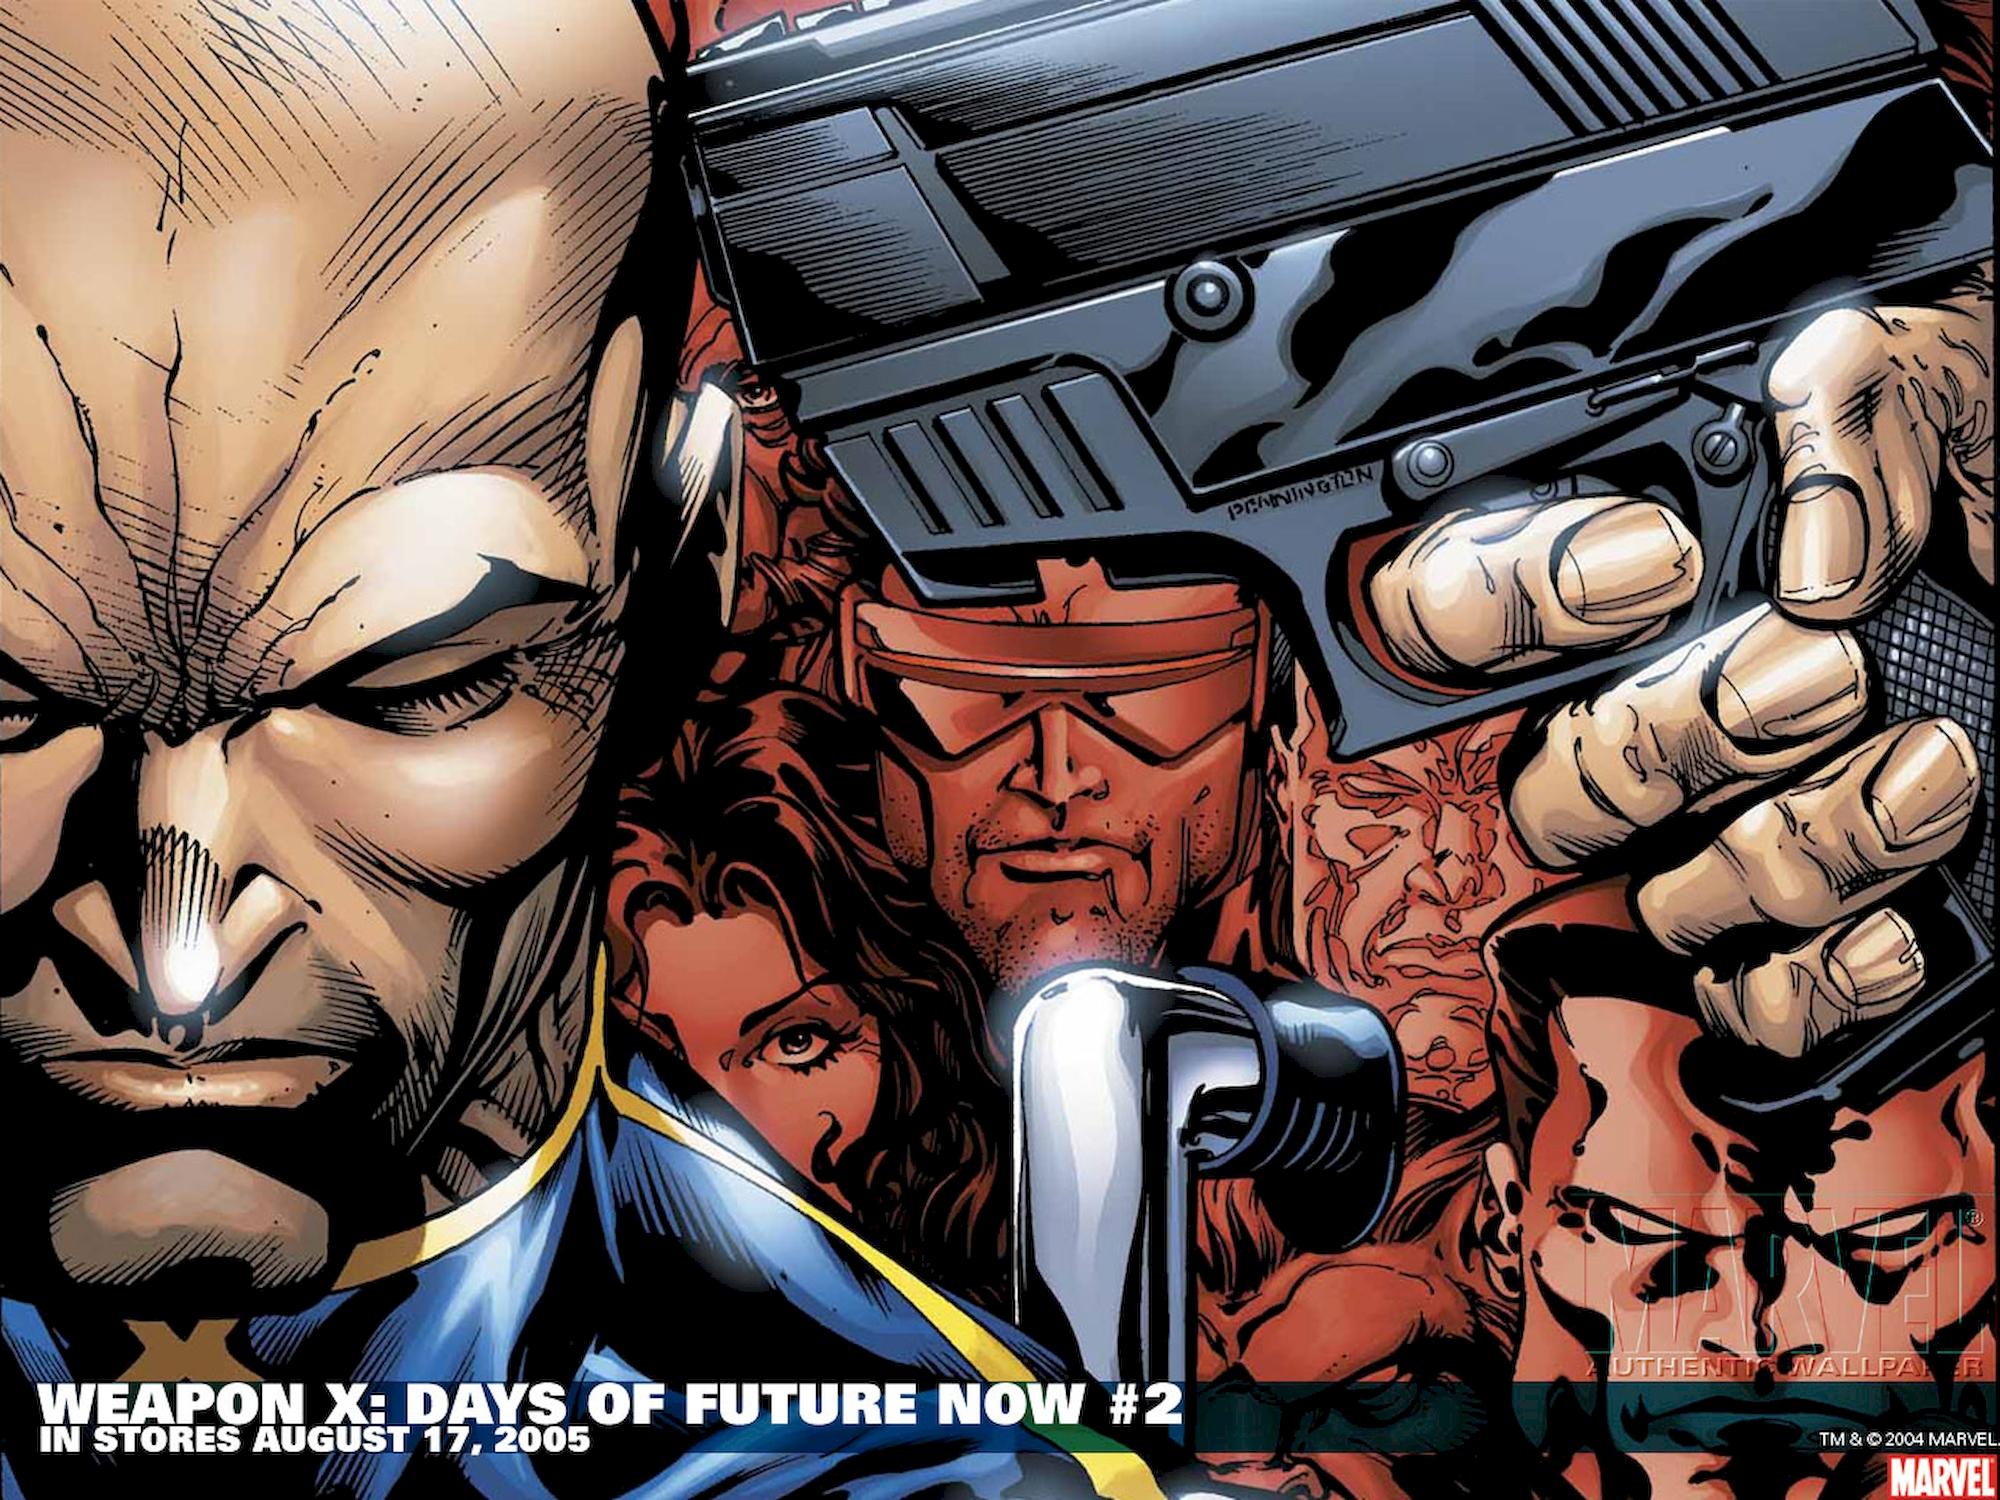 Days-of-future-now-heros-marvel